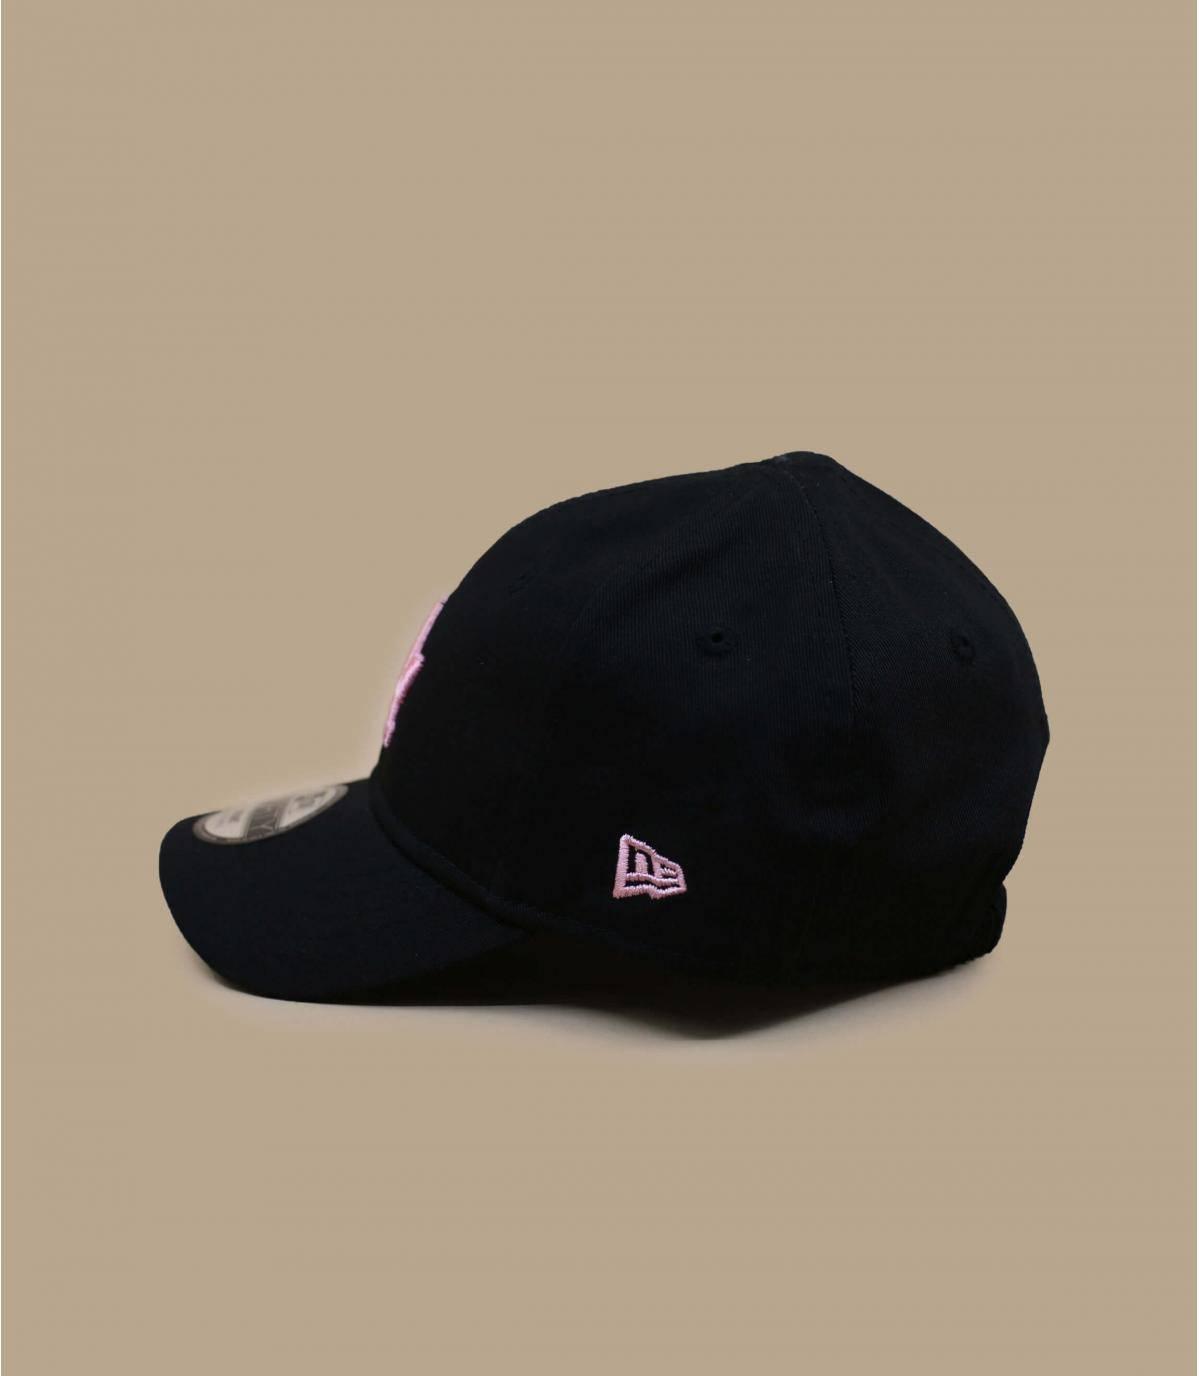 zwarte LA babypet